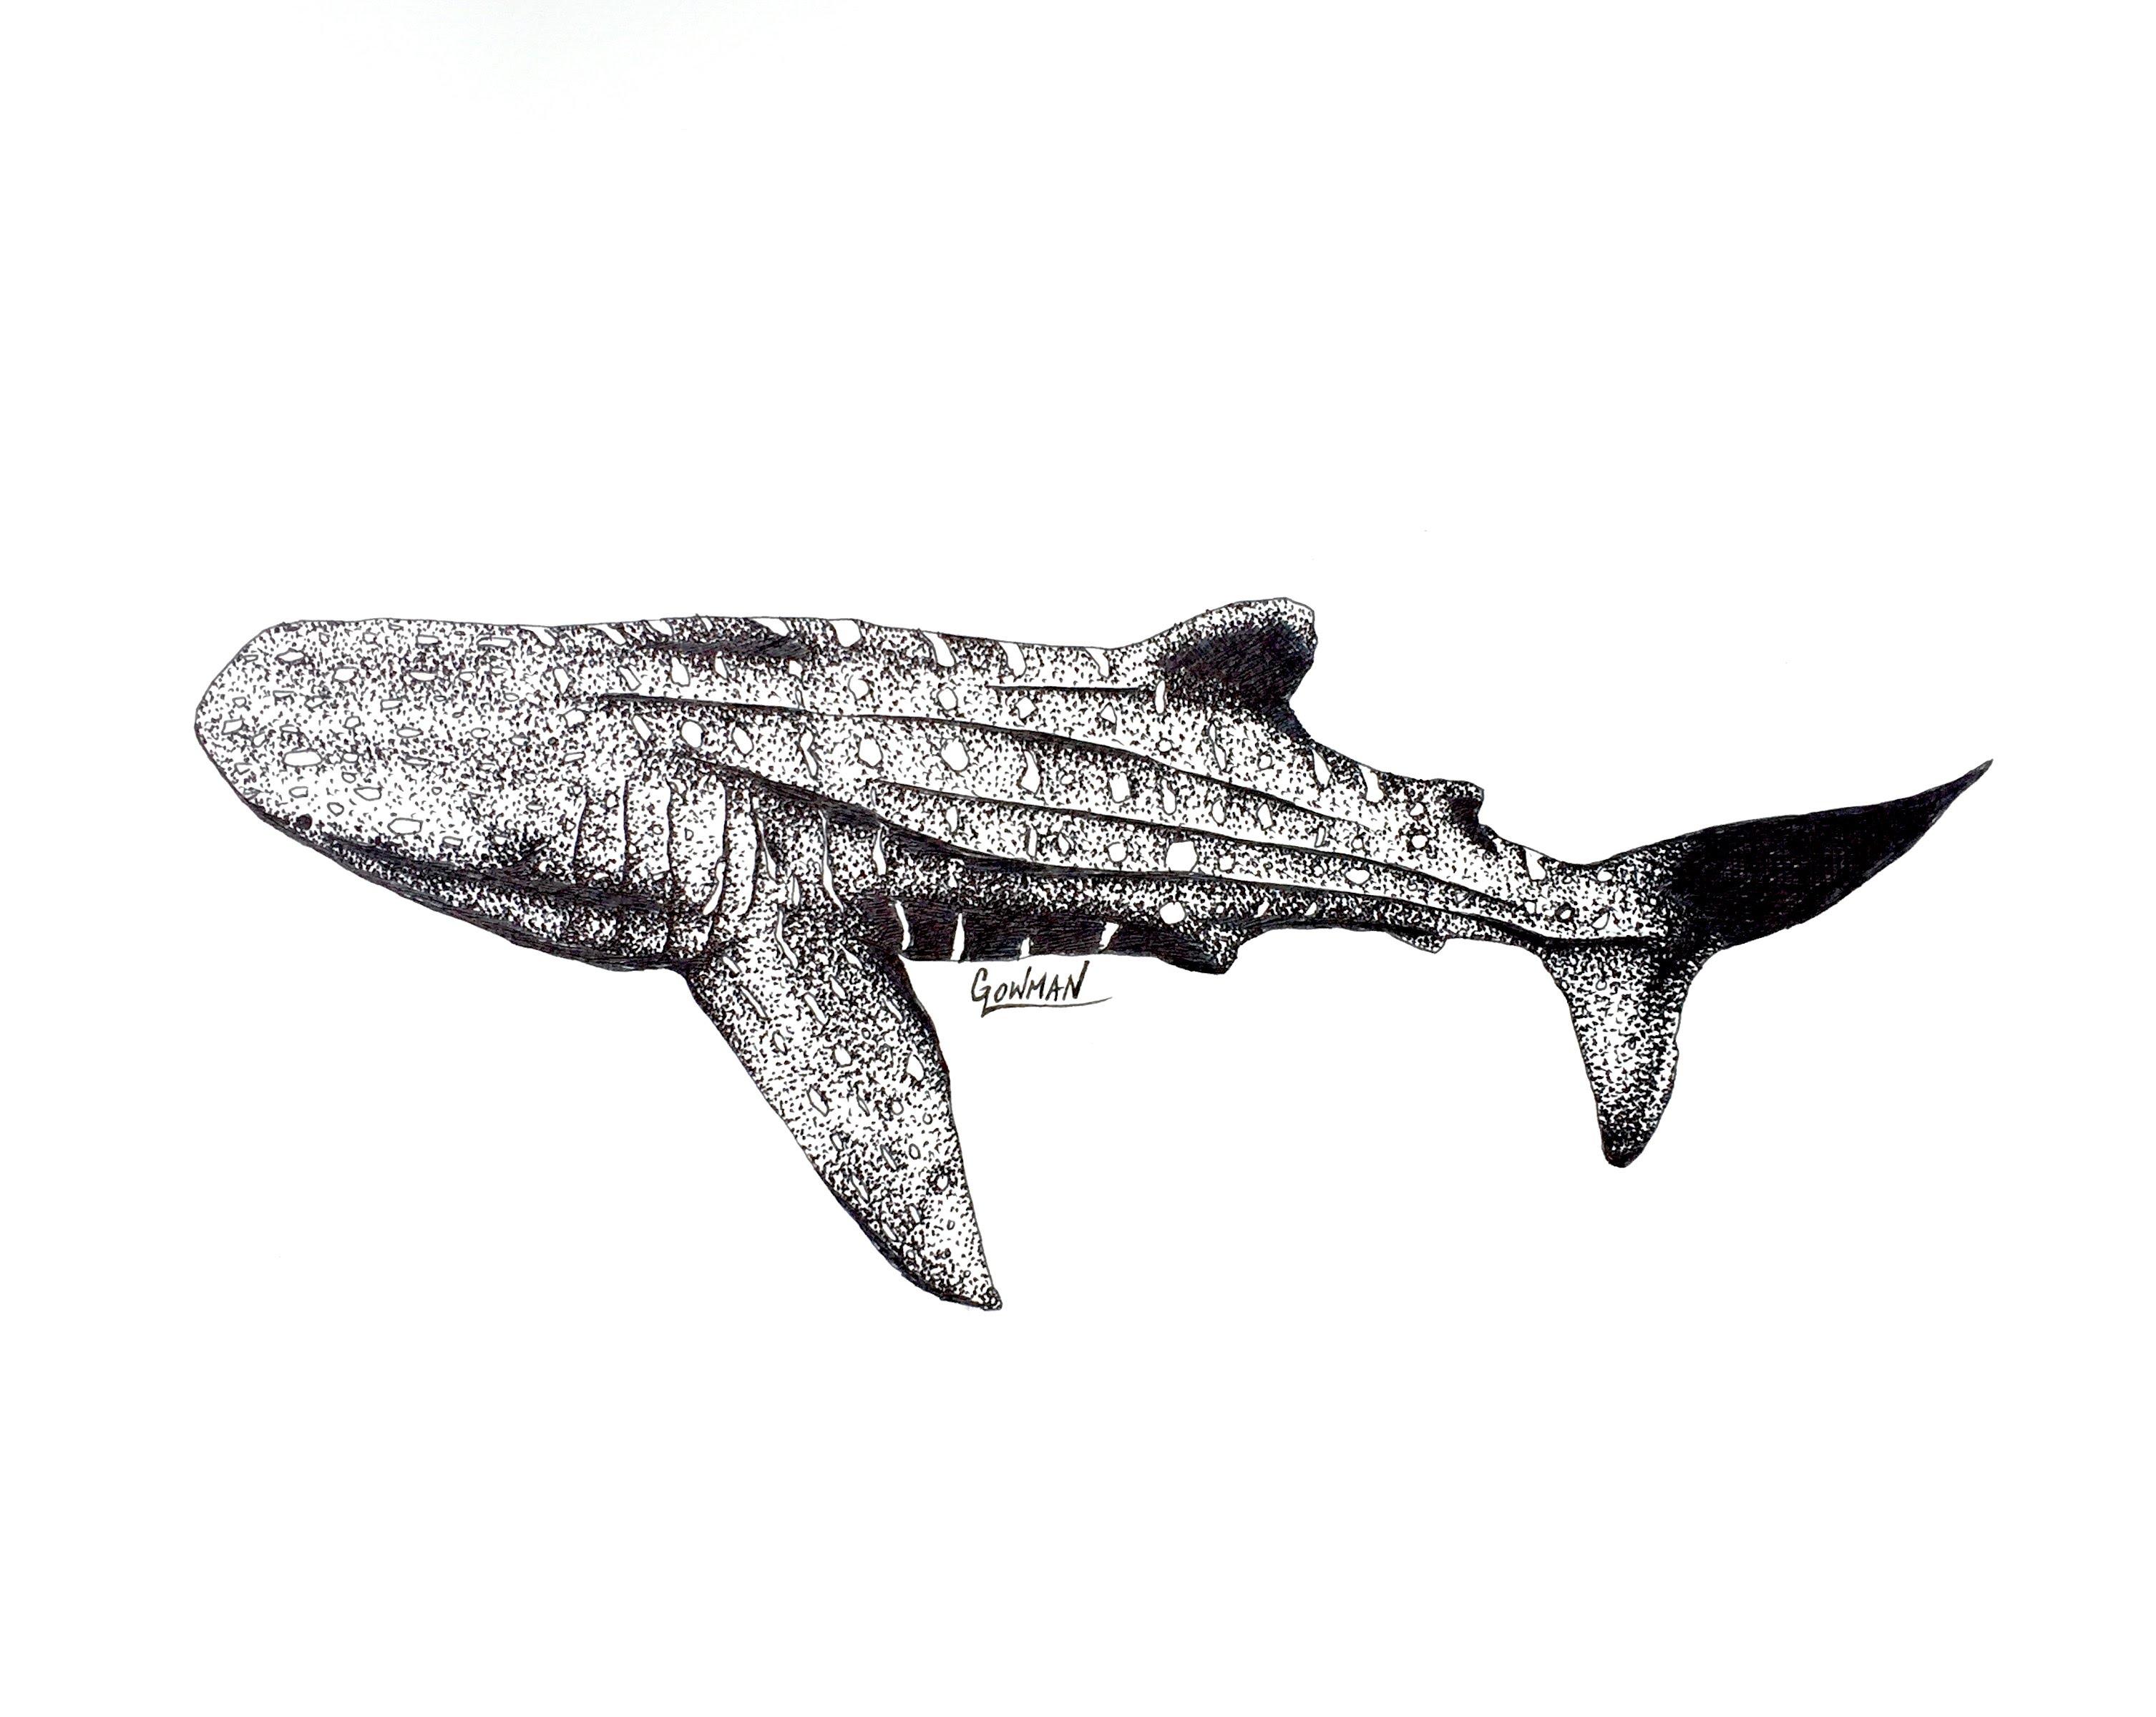 Drawn shark whale shark Artwork YouTube Shark Whale Marine